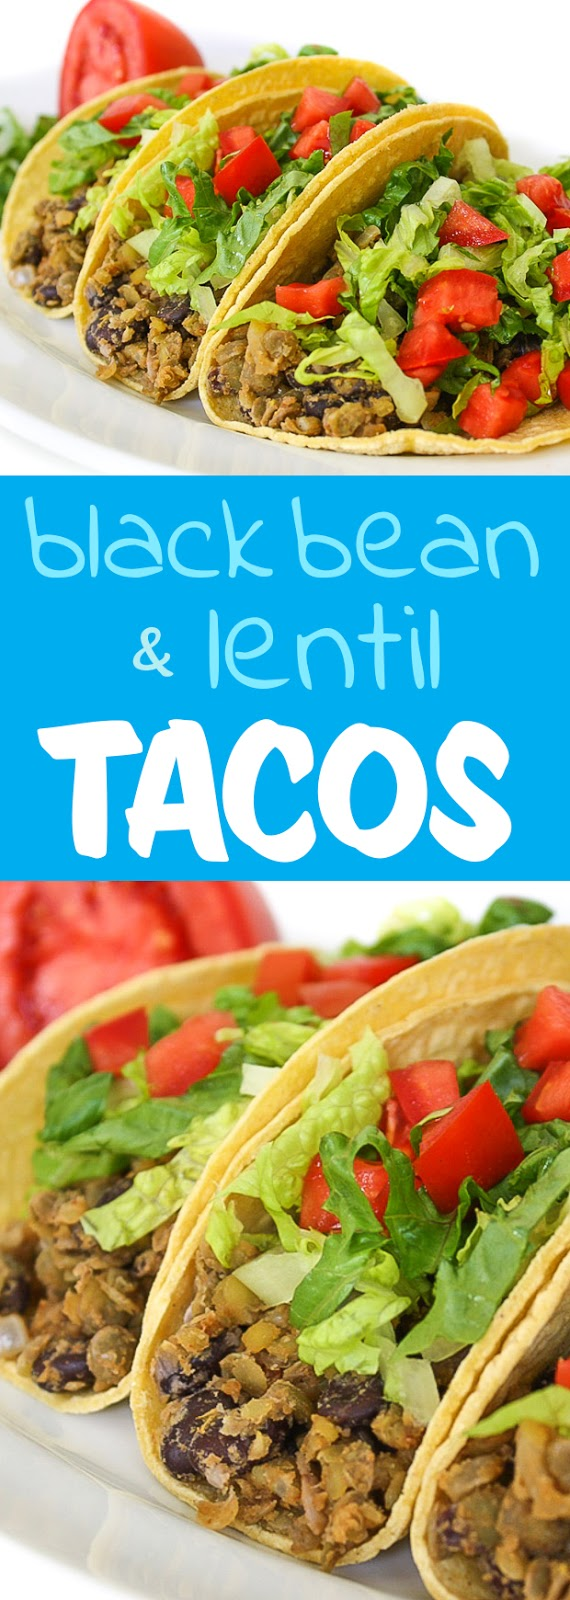 Photo collage of vegan black bean tacos